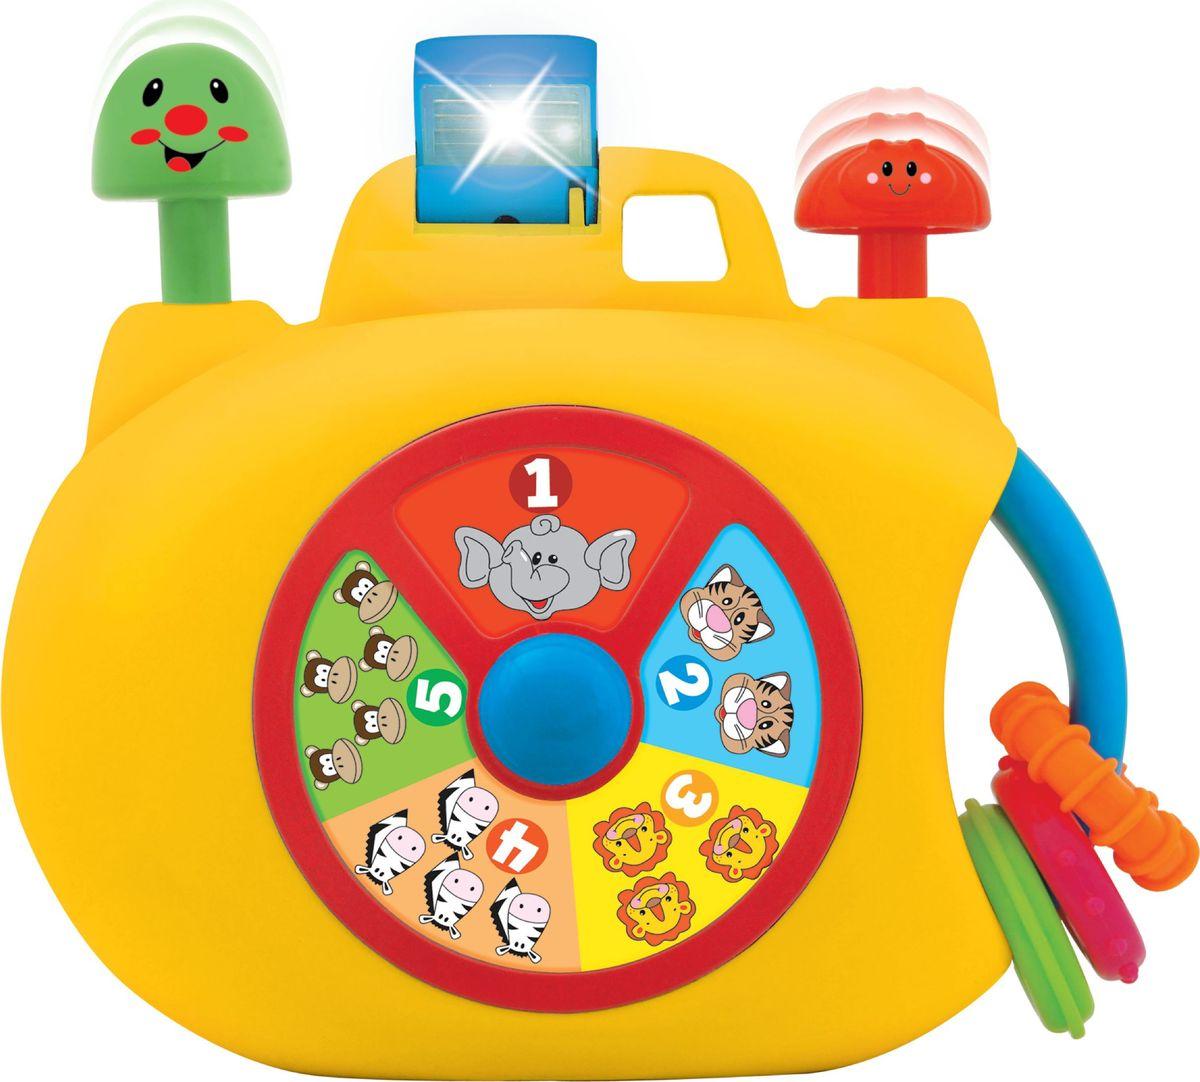 Kiddieland Развивающая игрушка Забавная камера kiddieland развивающая игрушка забавная камера